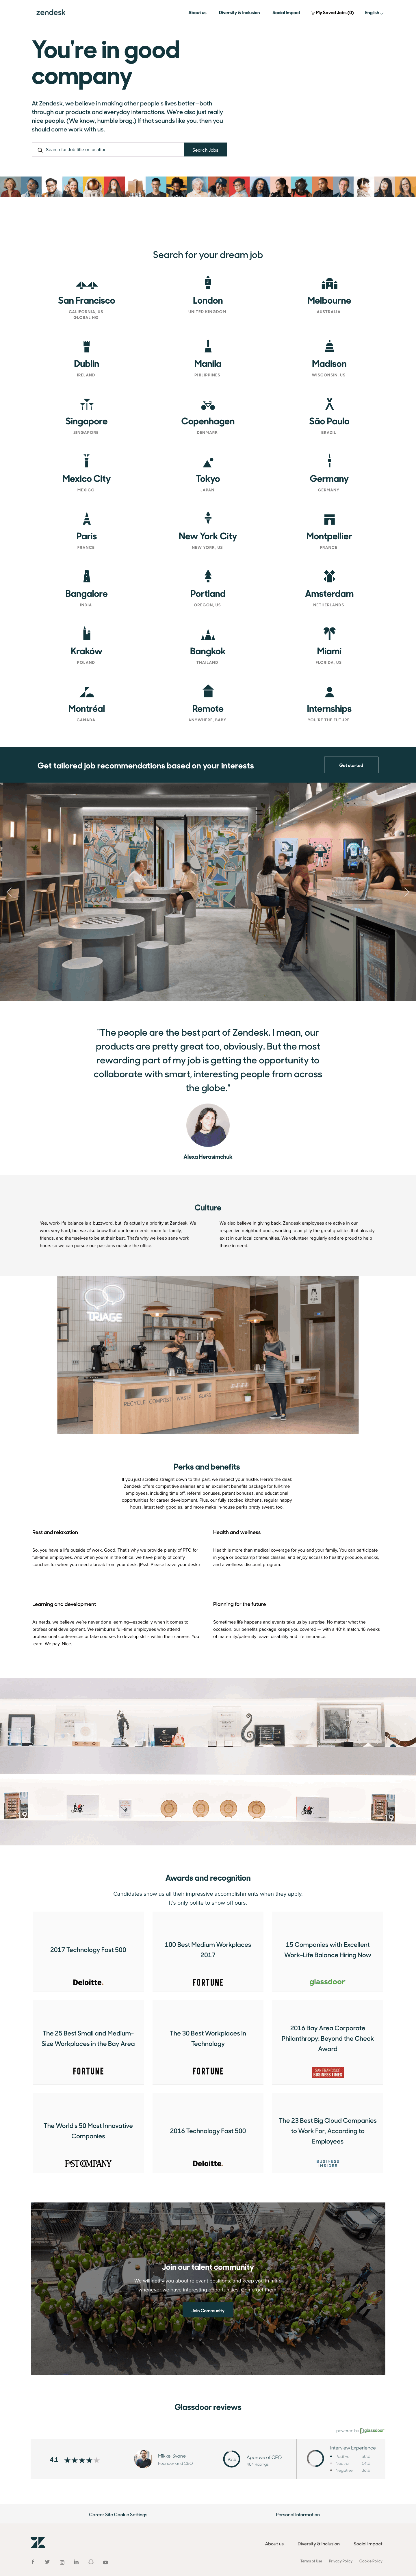 Zendesk Careers Page